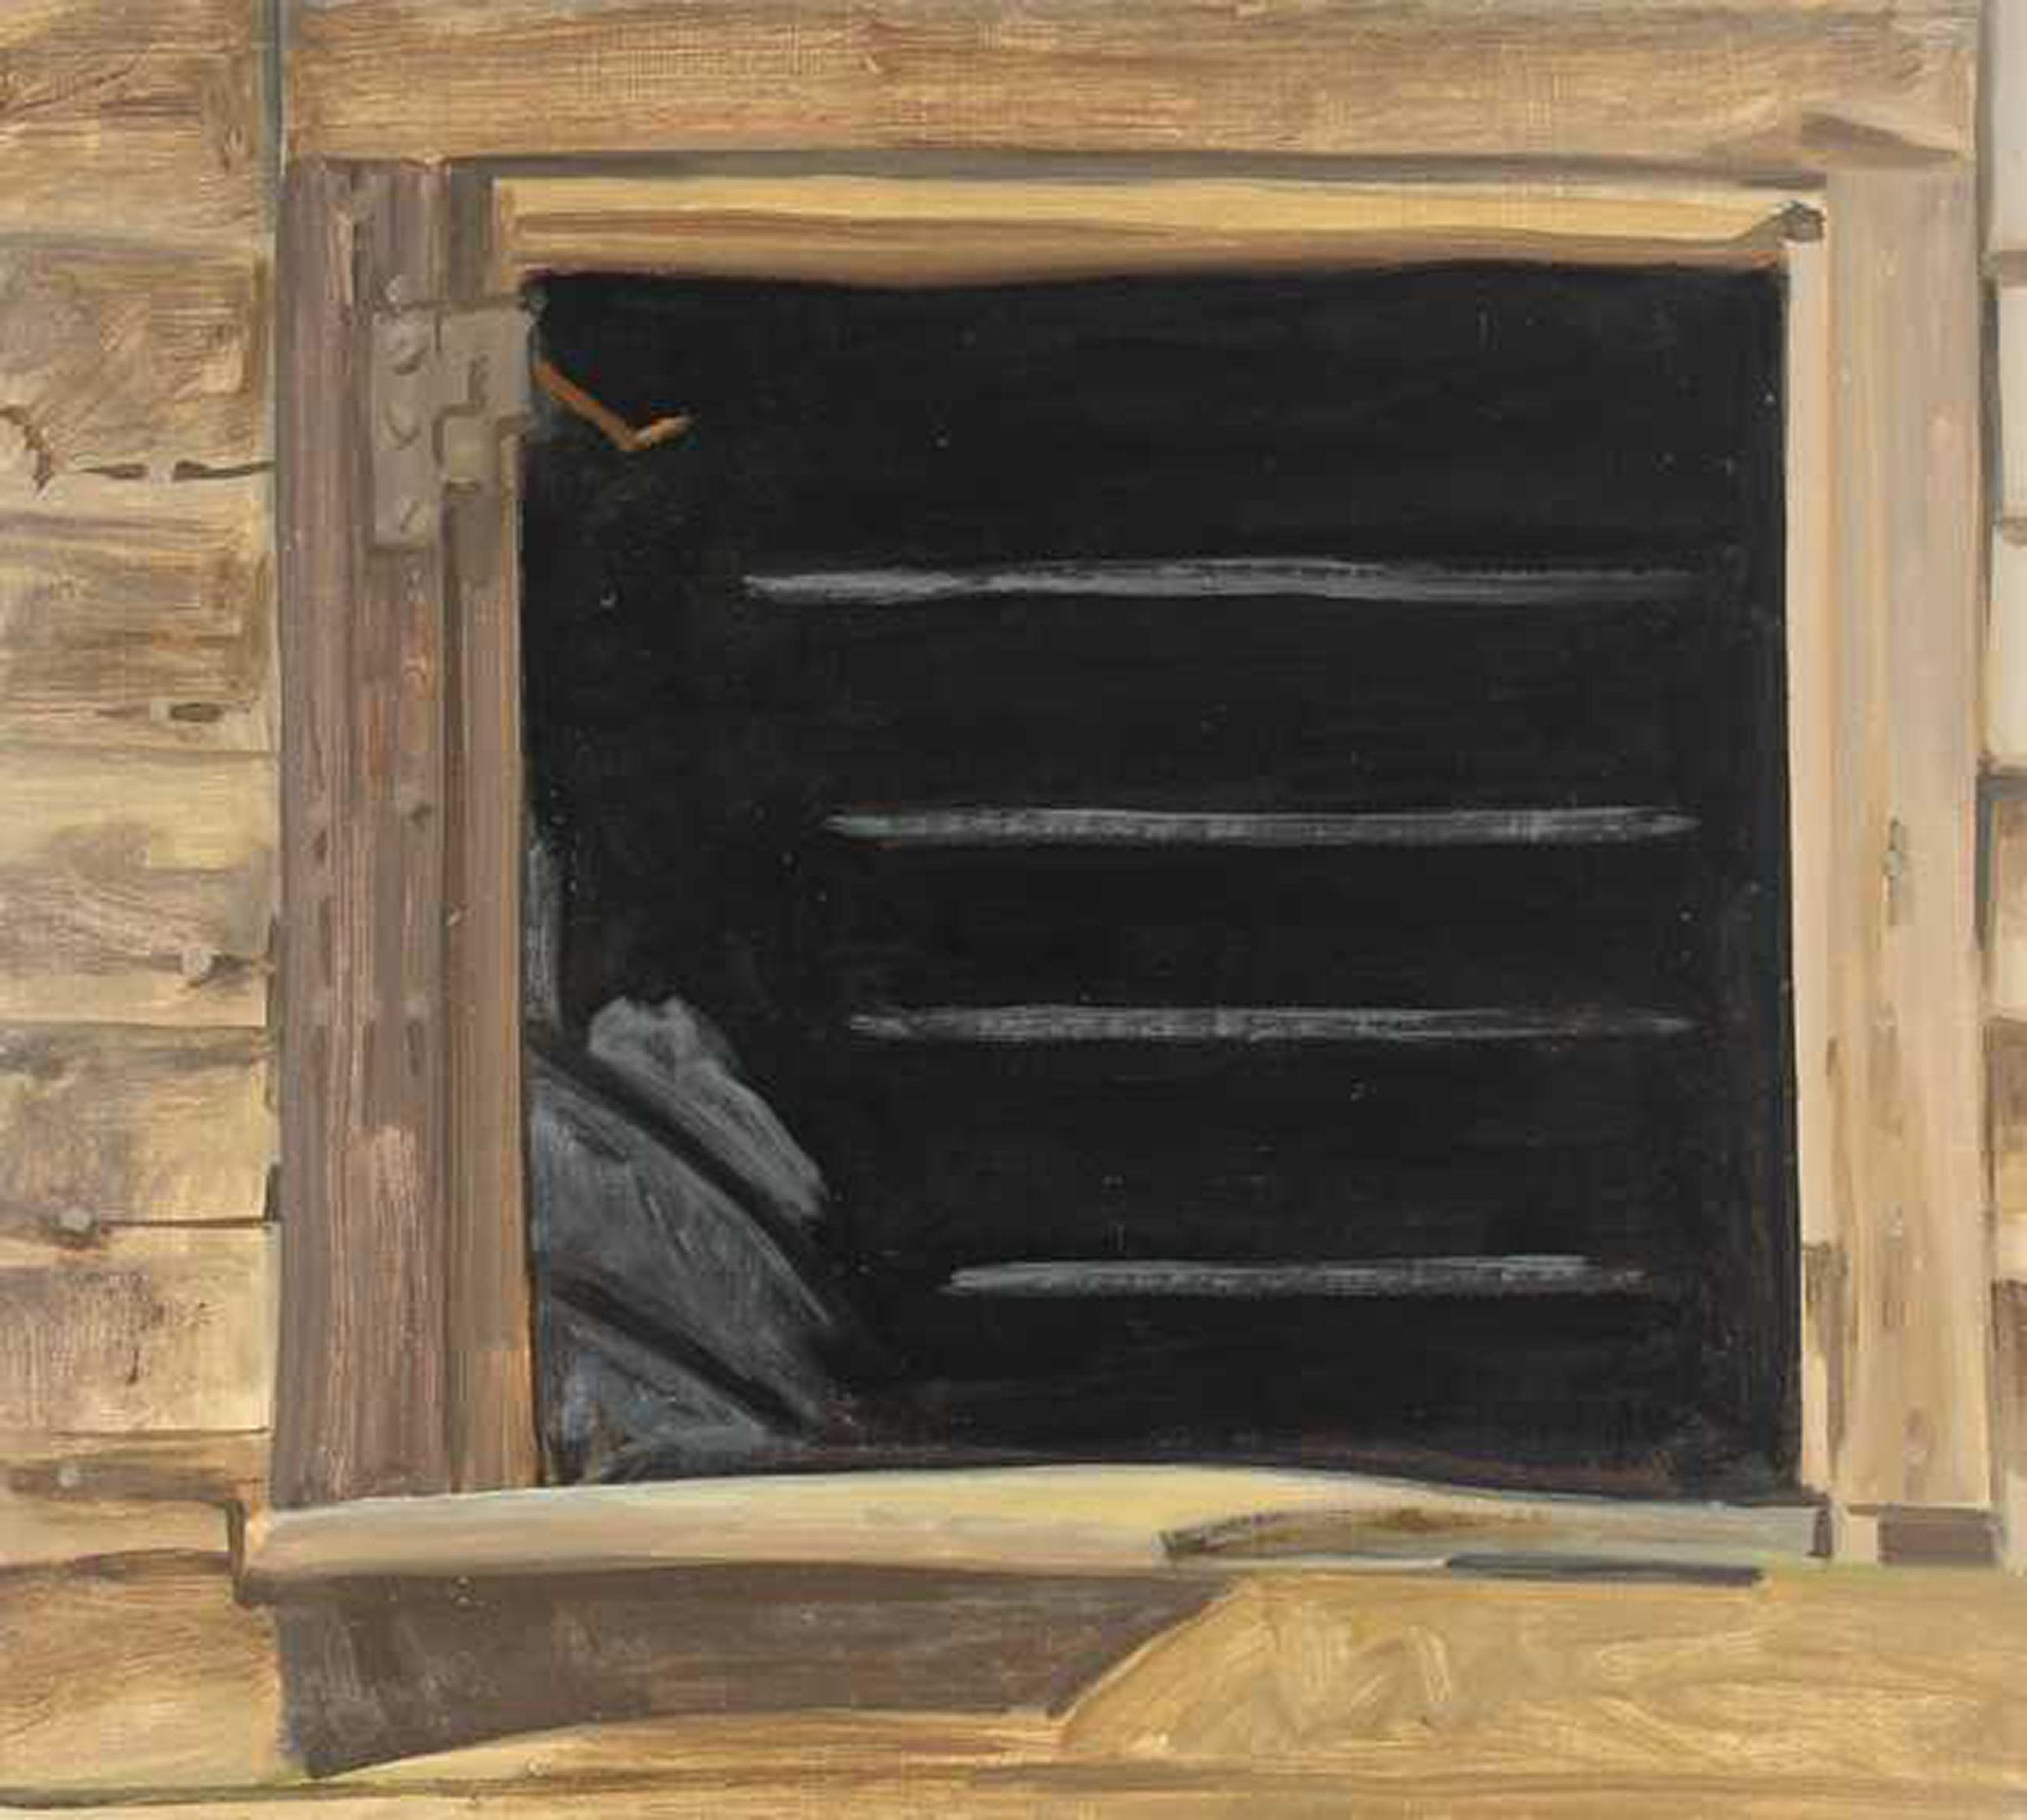 "Lois Dodd, Empty Window, Black, 1979, oil on masonite, 16""x 20"" courtesy Alexandre Gallery"